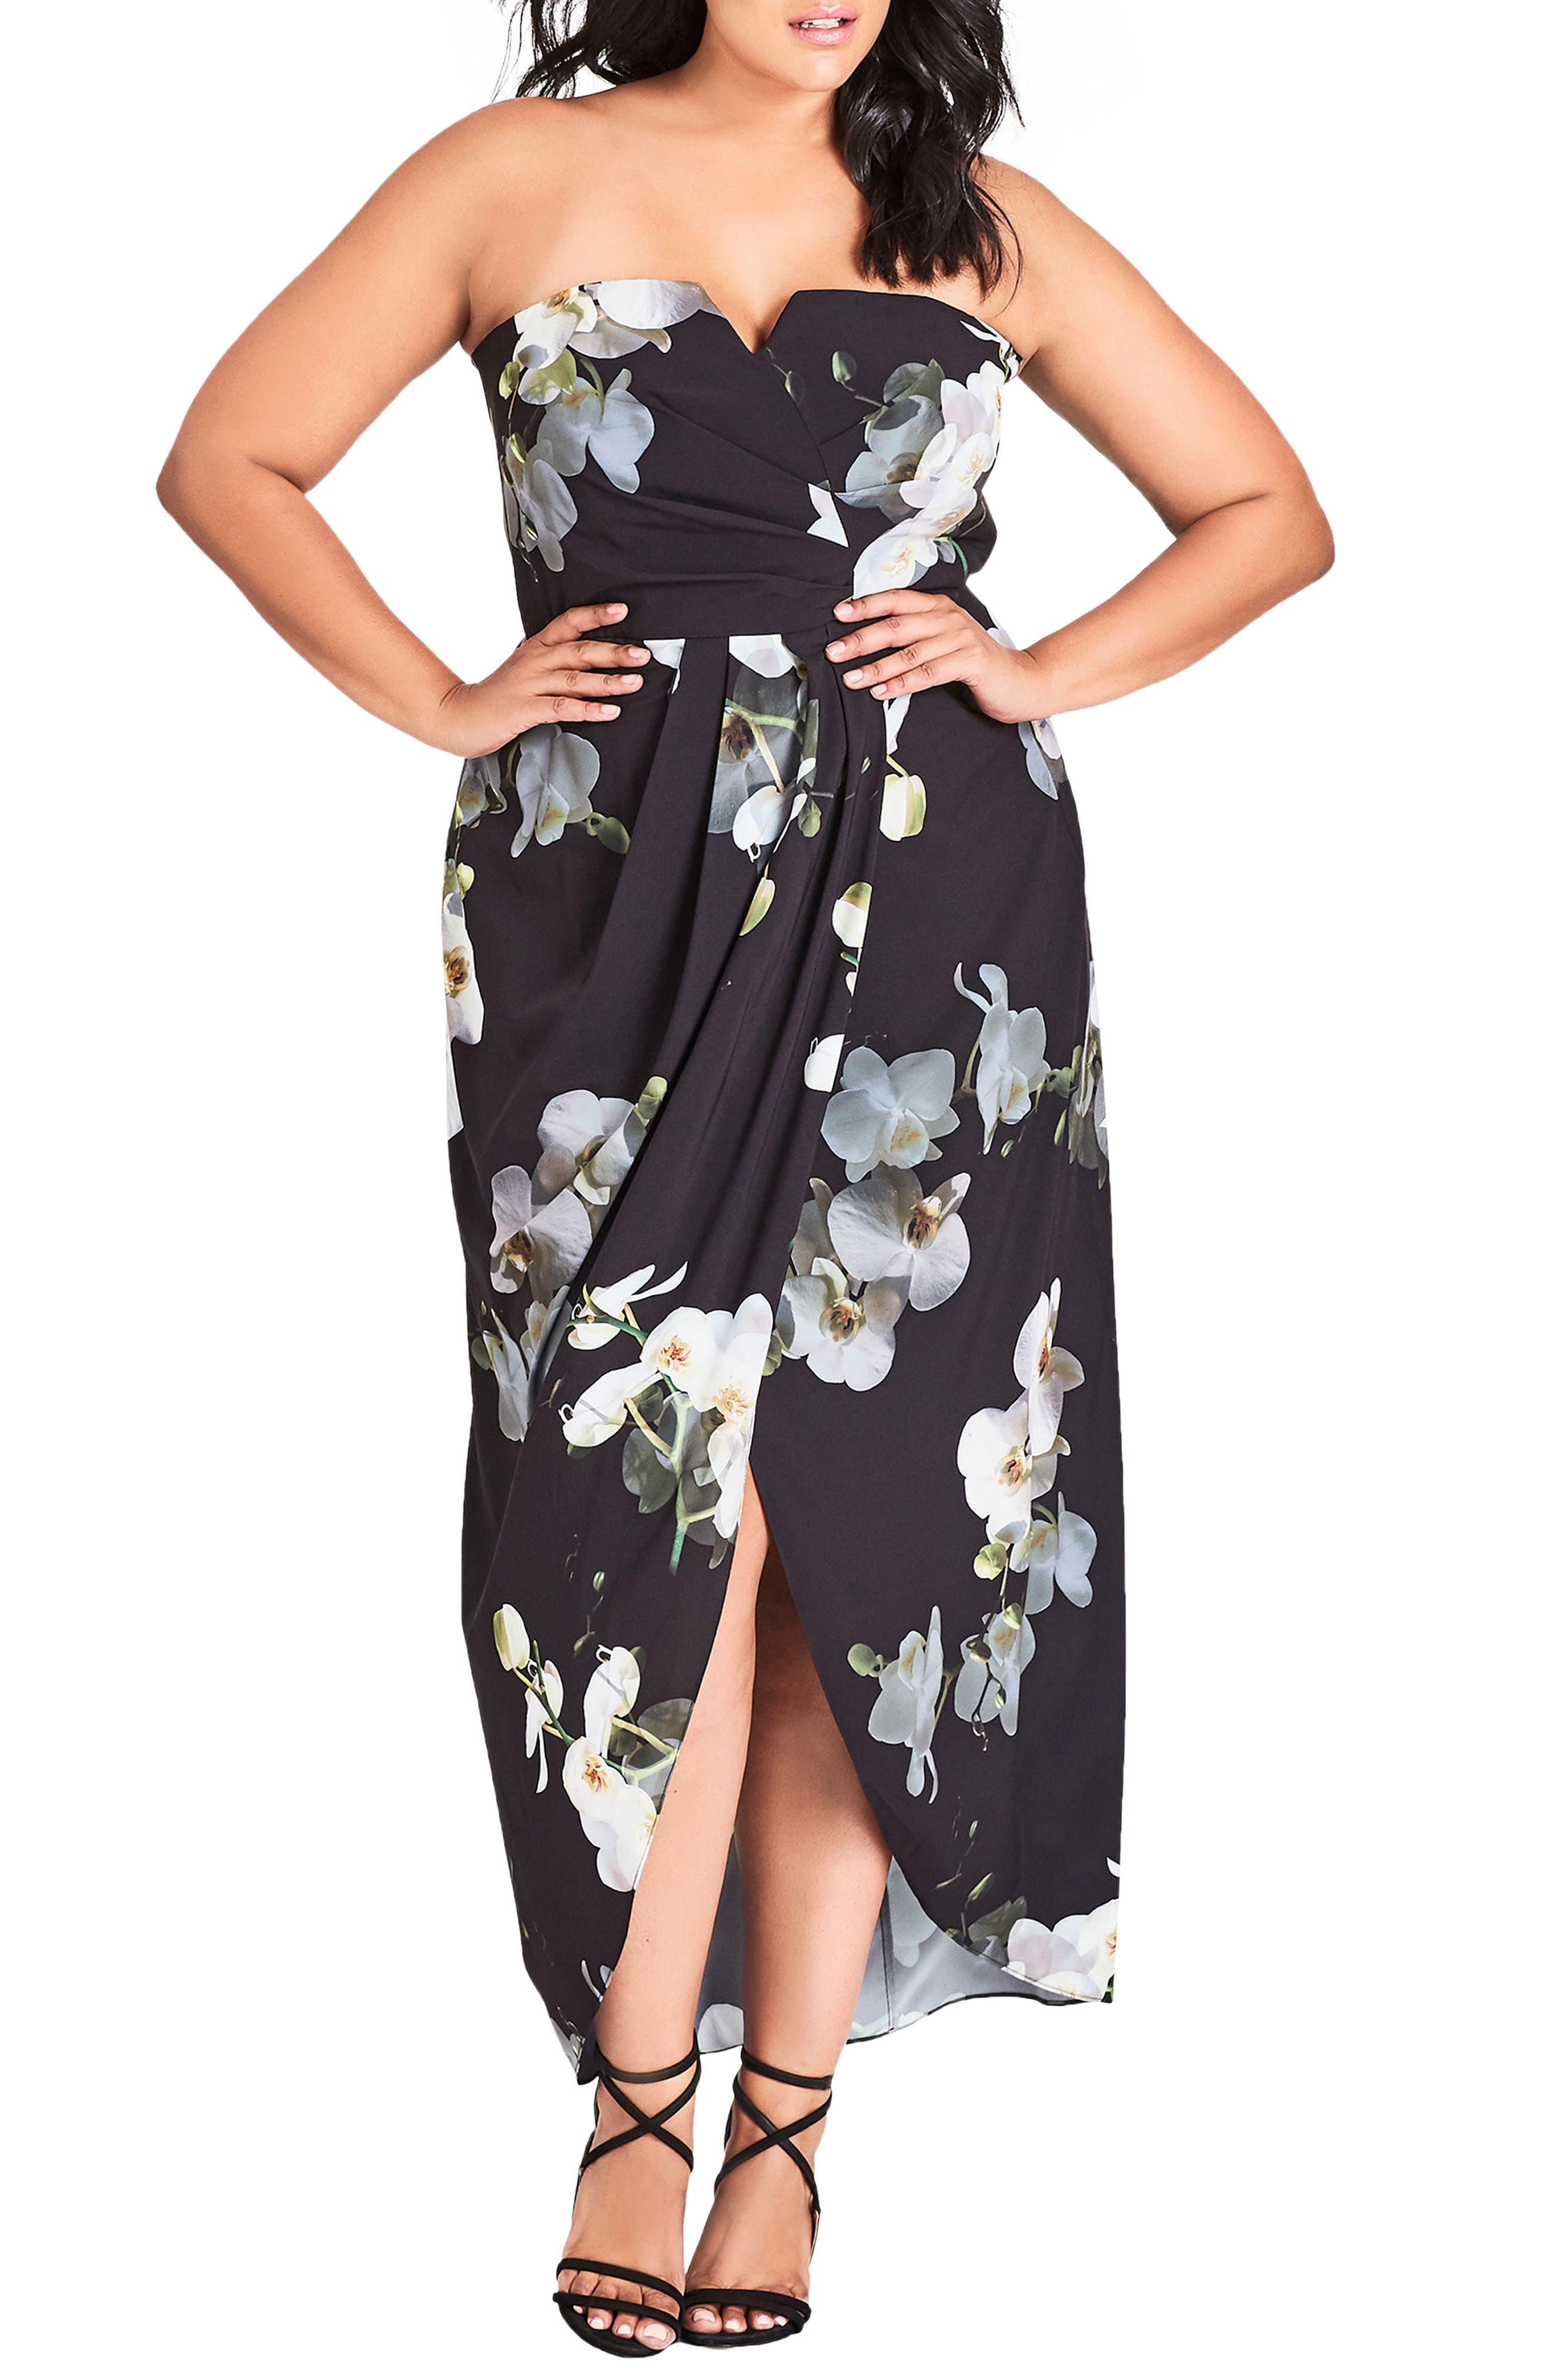 Plus Size City Chic Orchid Dreams Strapless Maxi Dress, Black